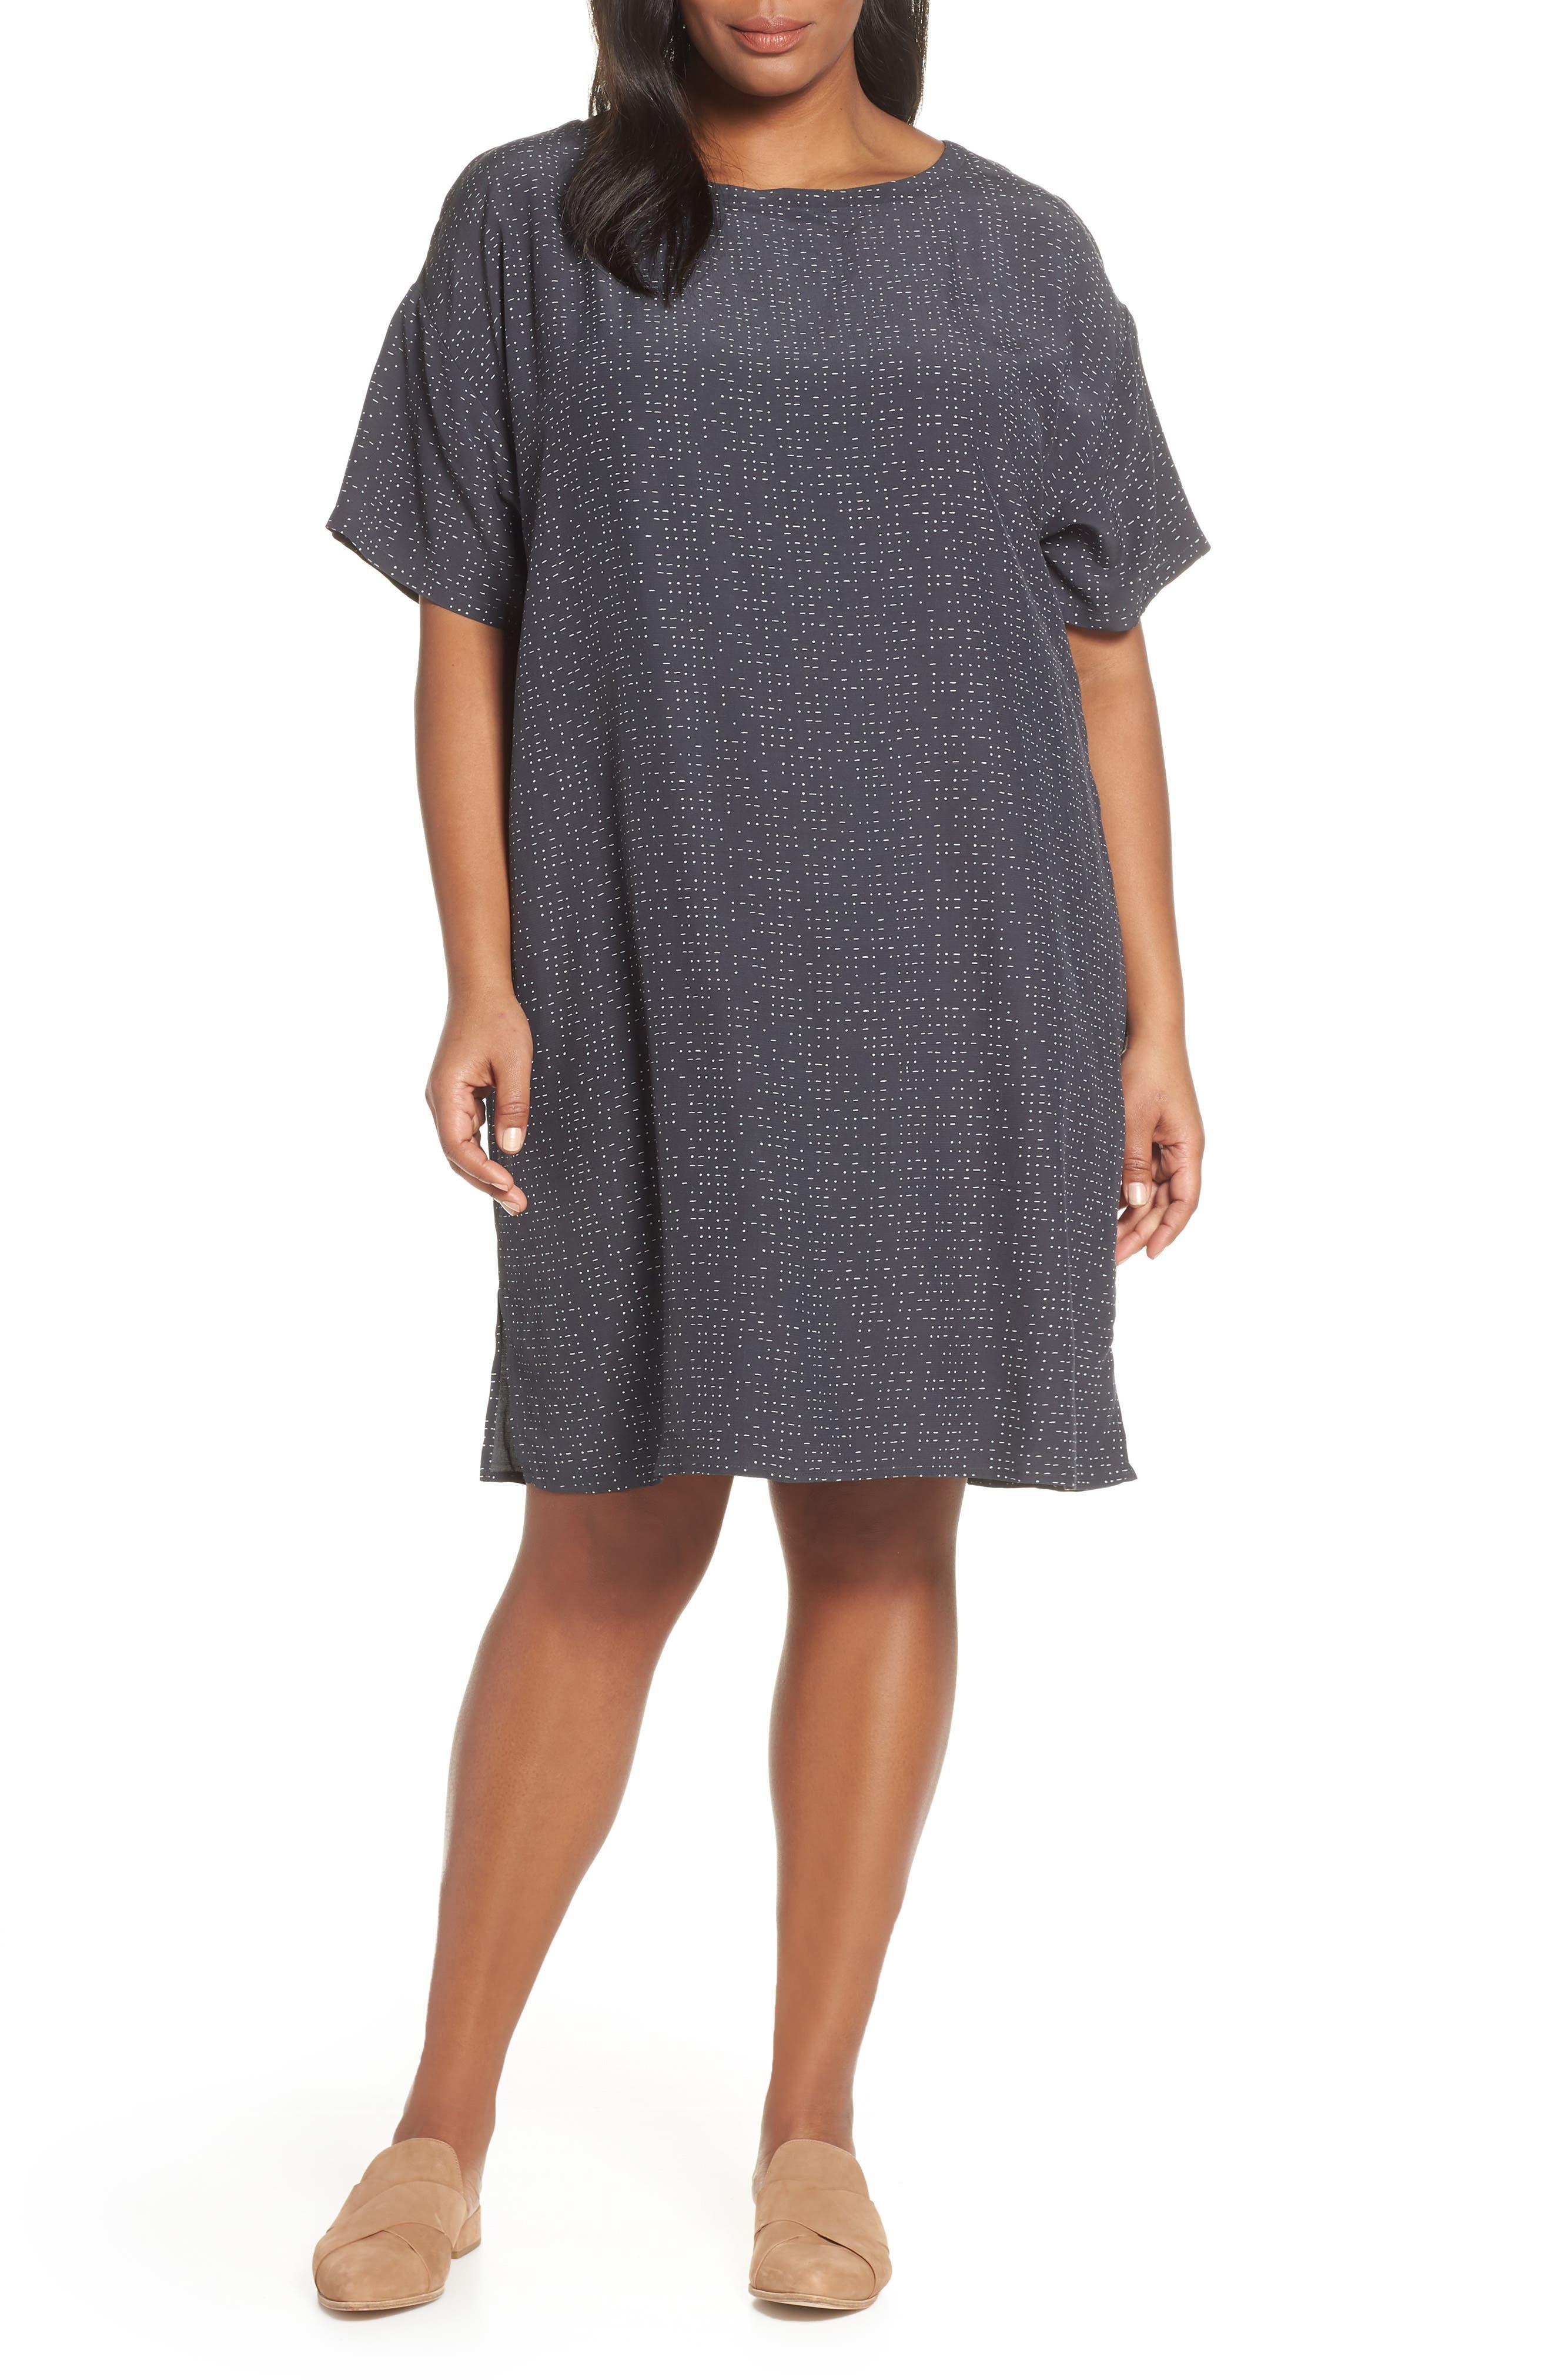 Plus Size Eileen Fisher Bateau Neck Shift Dress, Grey